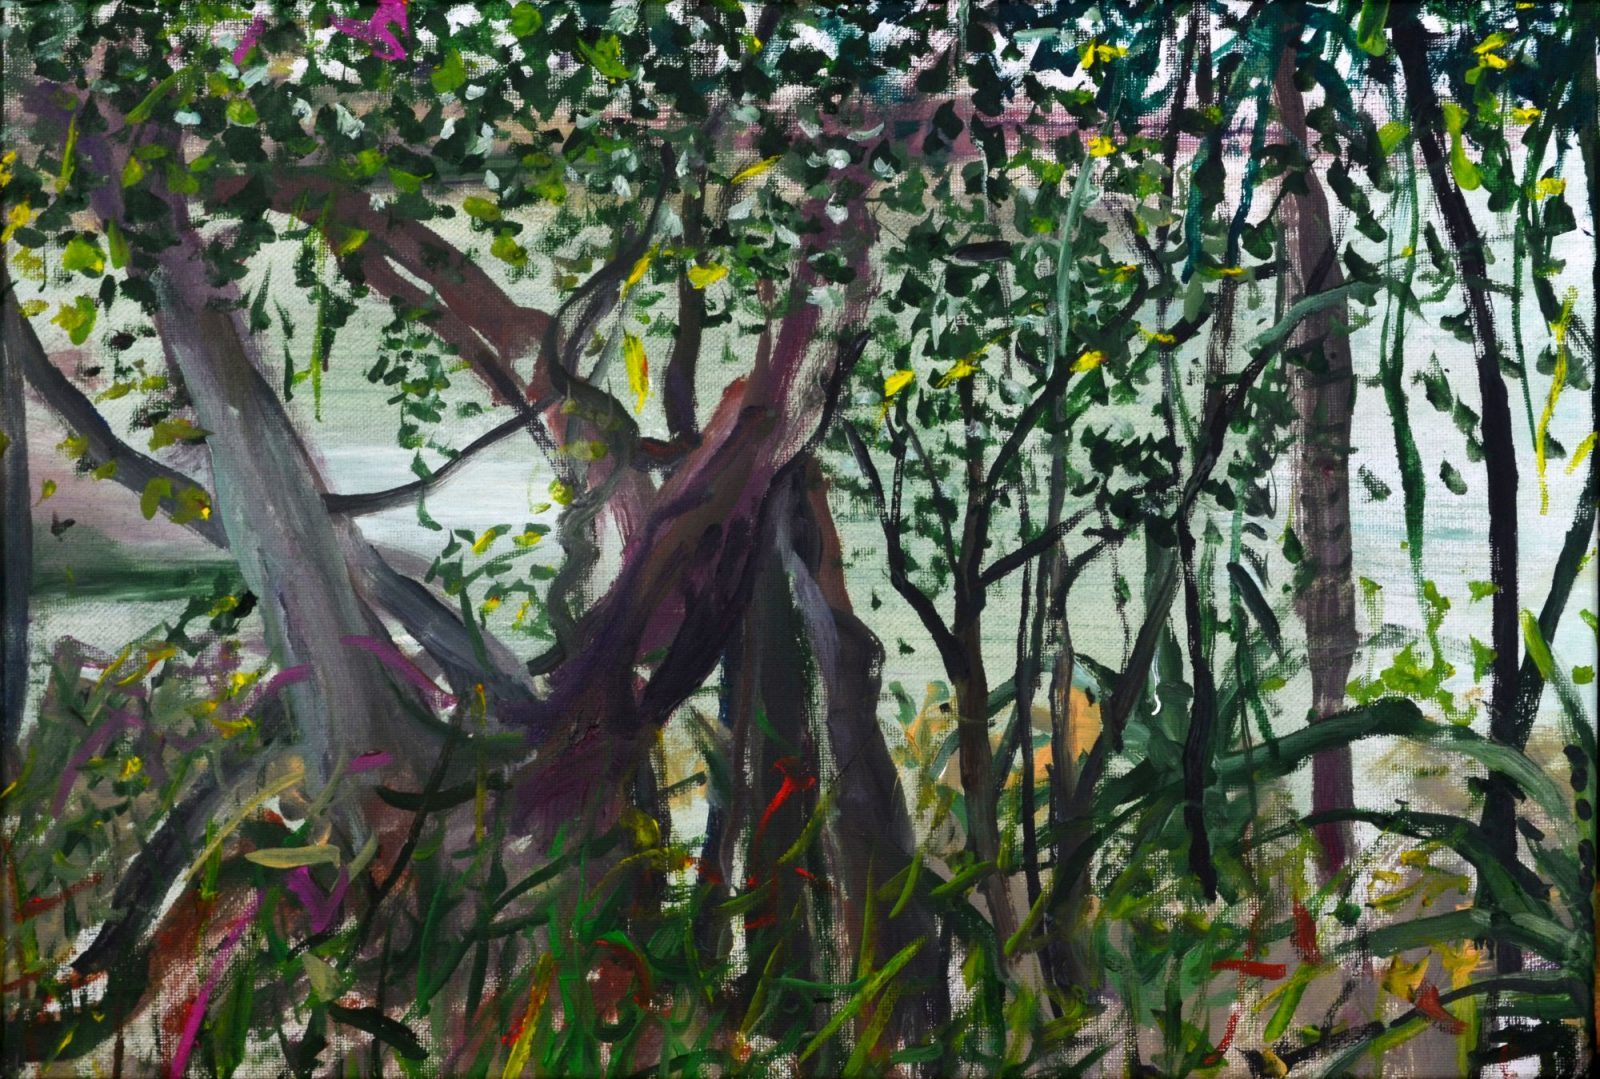 franyo aatoth: Garden Series 7.